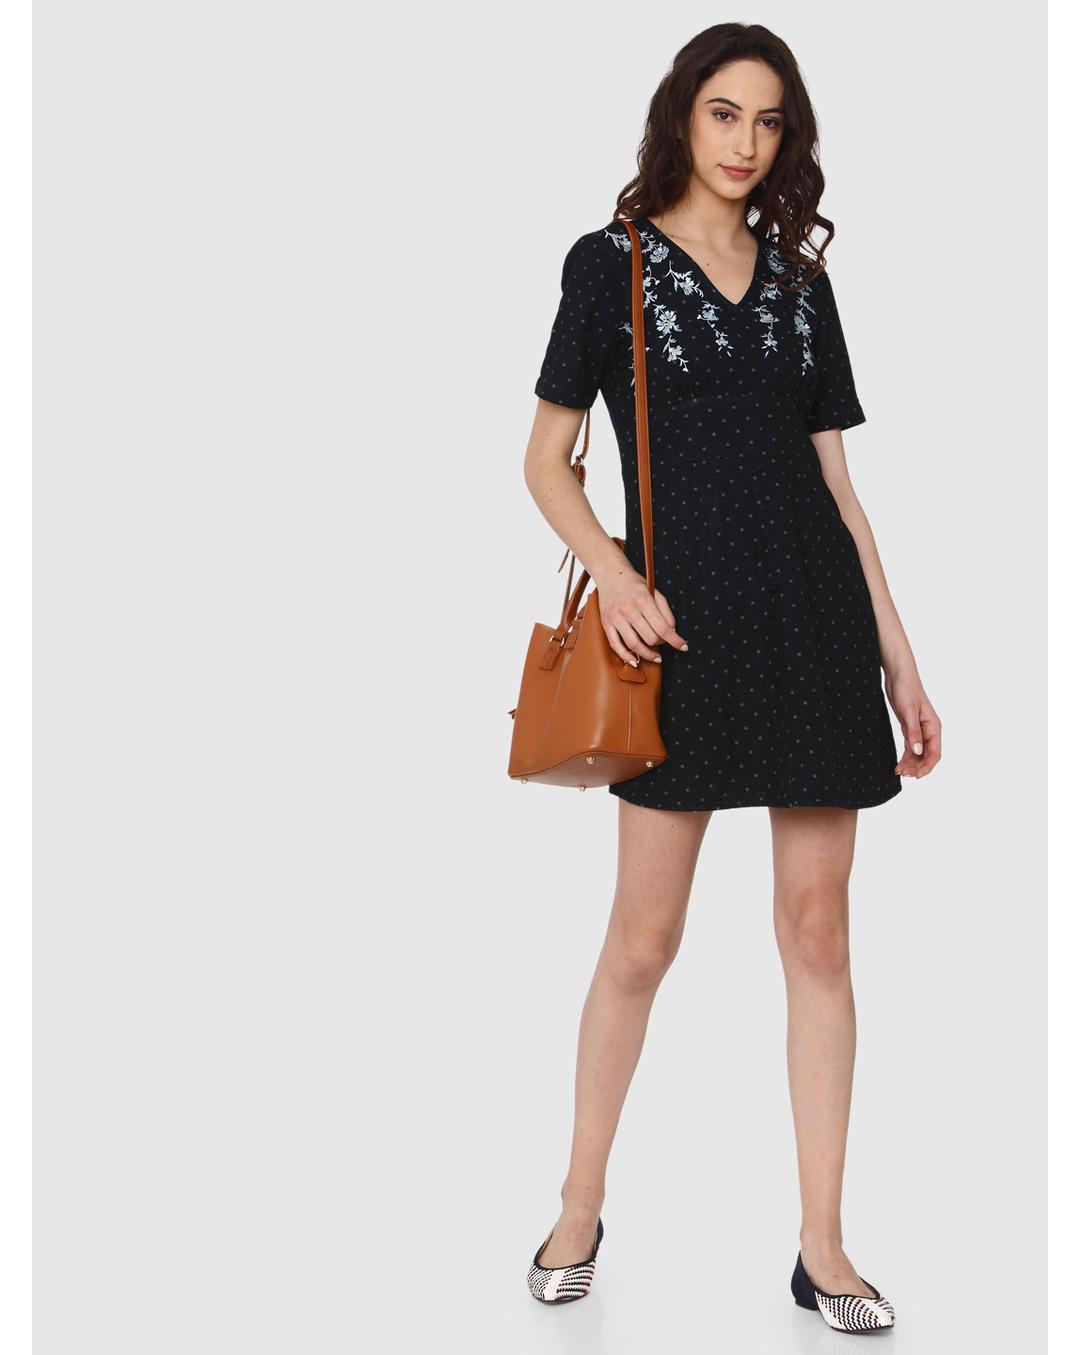 Buy Vero Moda Dark Blue All Over Polka Dot Floral Embroidery